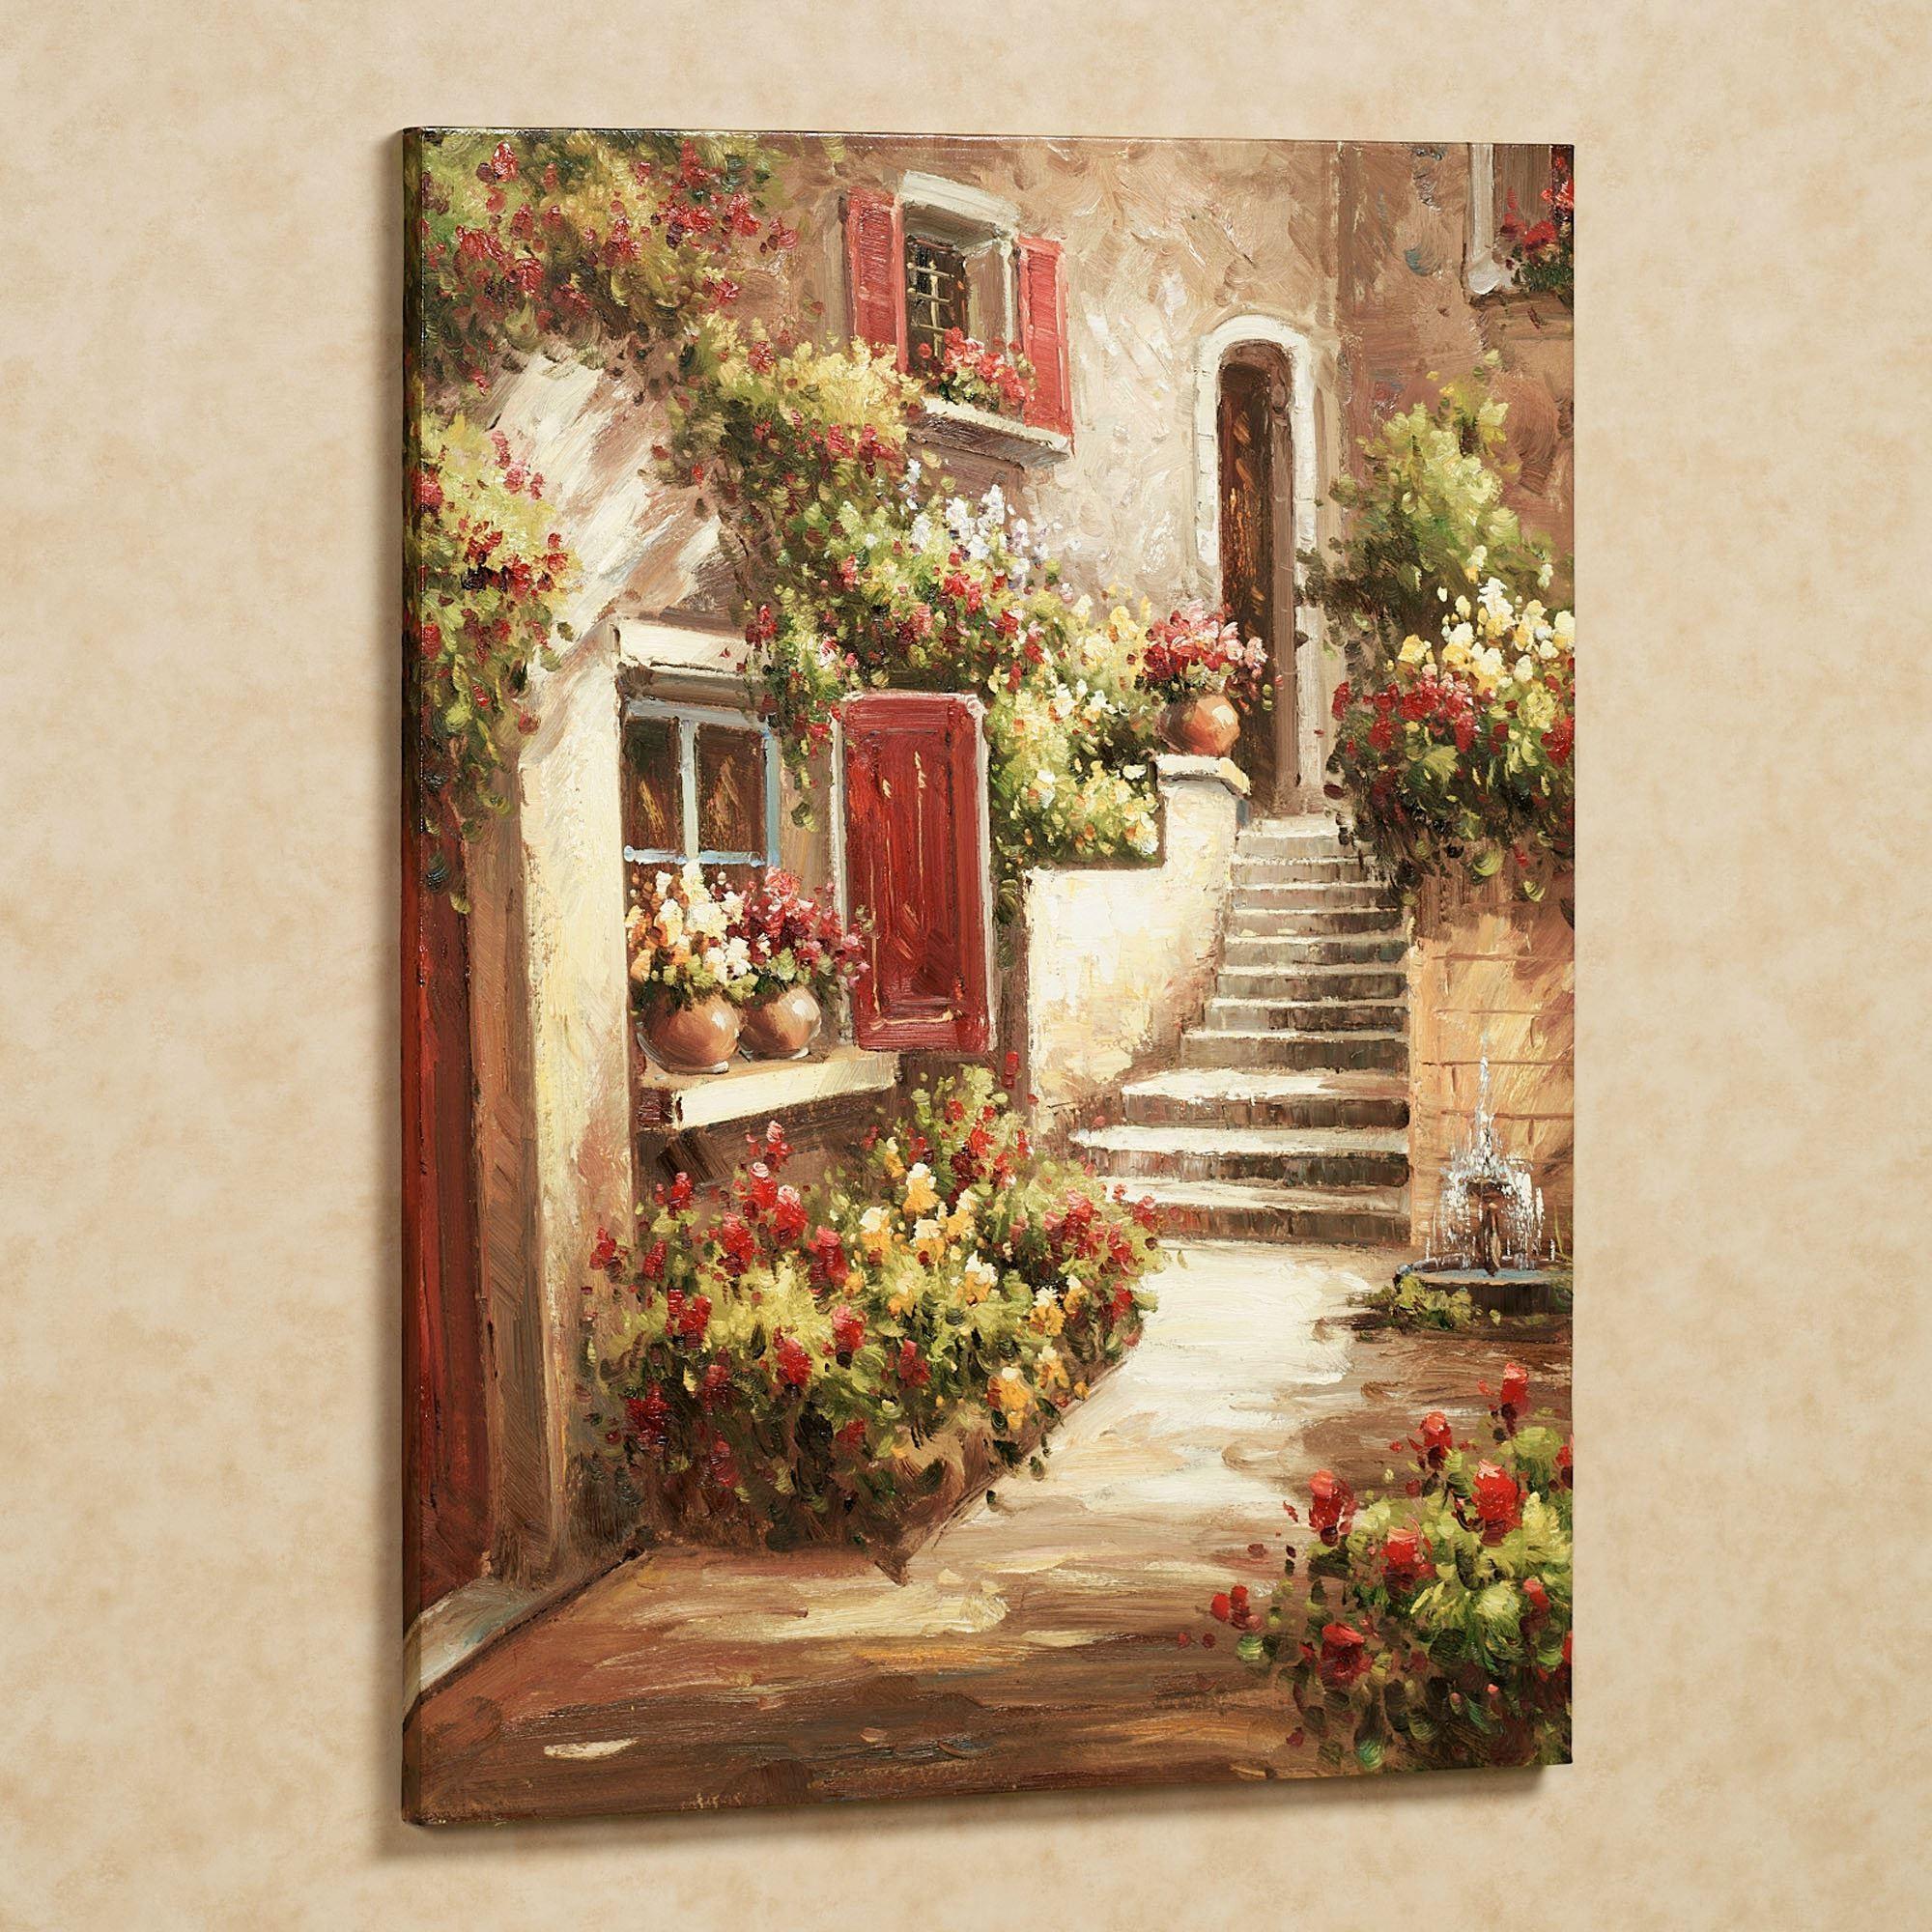 Tuscan Wall Art New Diy Wall Art For Cheap Wall Art – Home Inside Cheap Italian Wall Art (View 4 of 20)